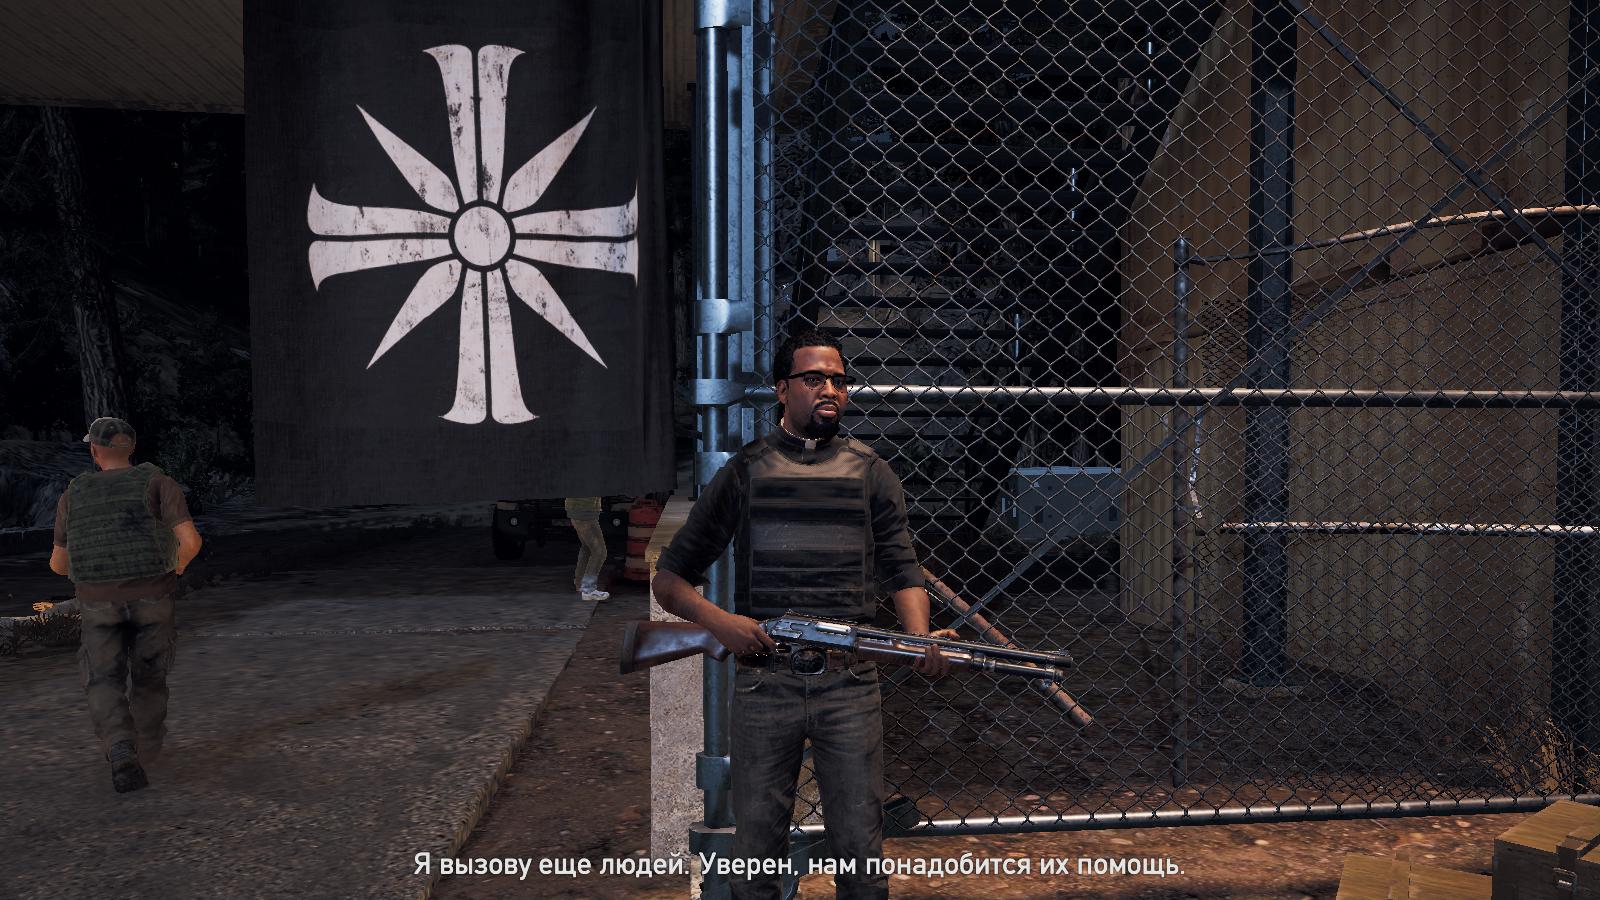 Far Cry 5 Screenshot 2018.04.27 - 00.45.20.27.png - -